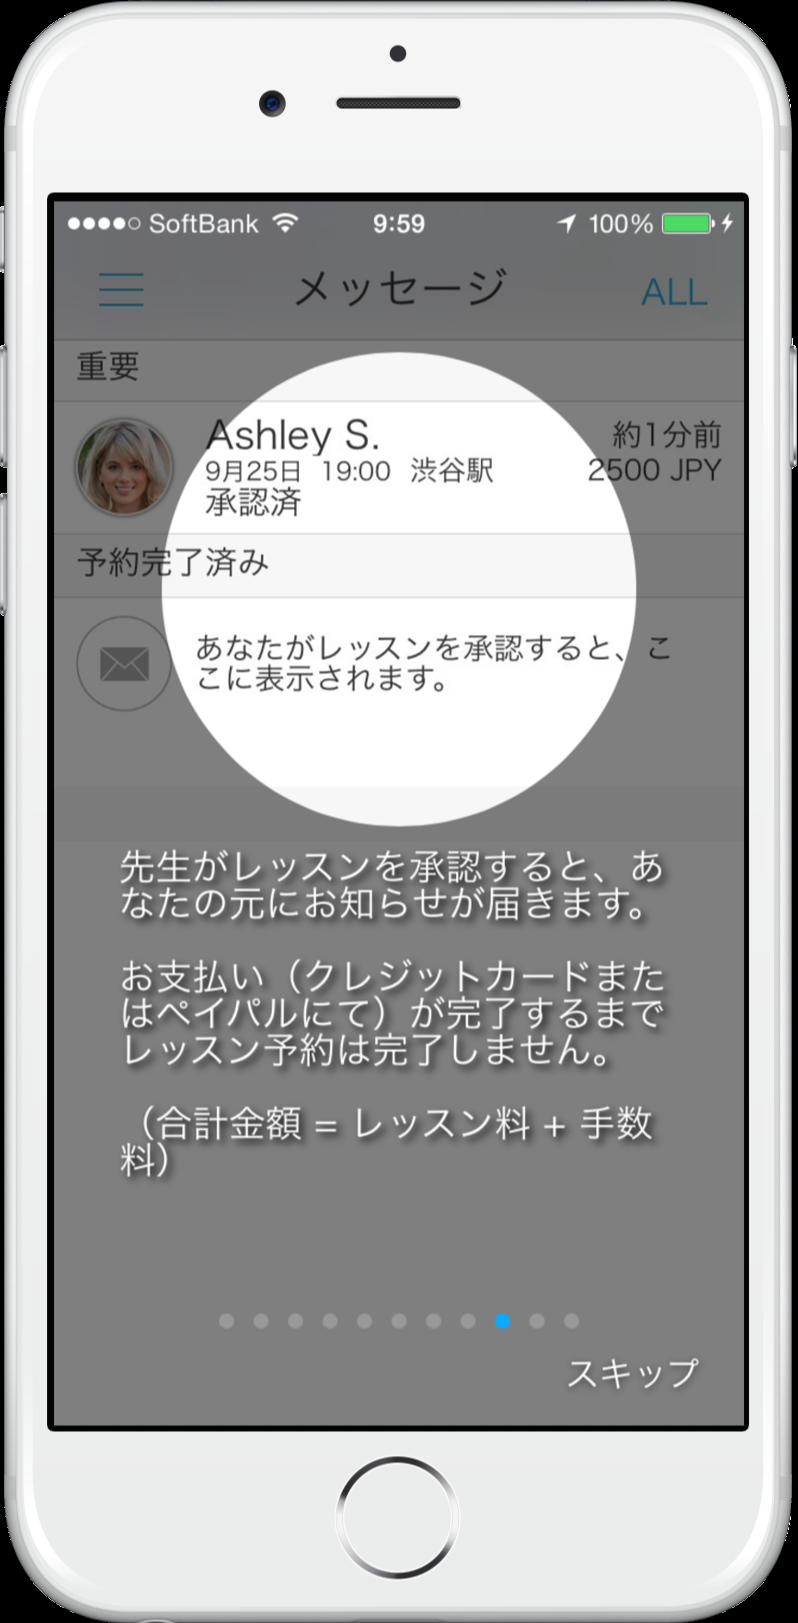 eikaiwaNOW - レッスンの流れ - JPN - 8_iphone6_silver_portrait.png